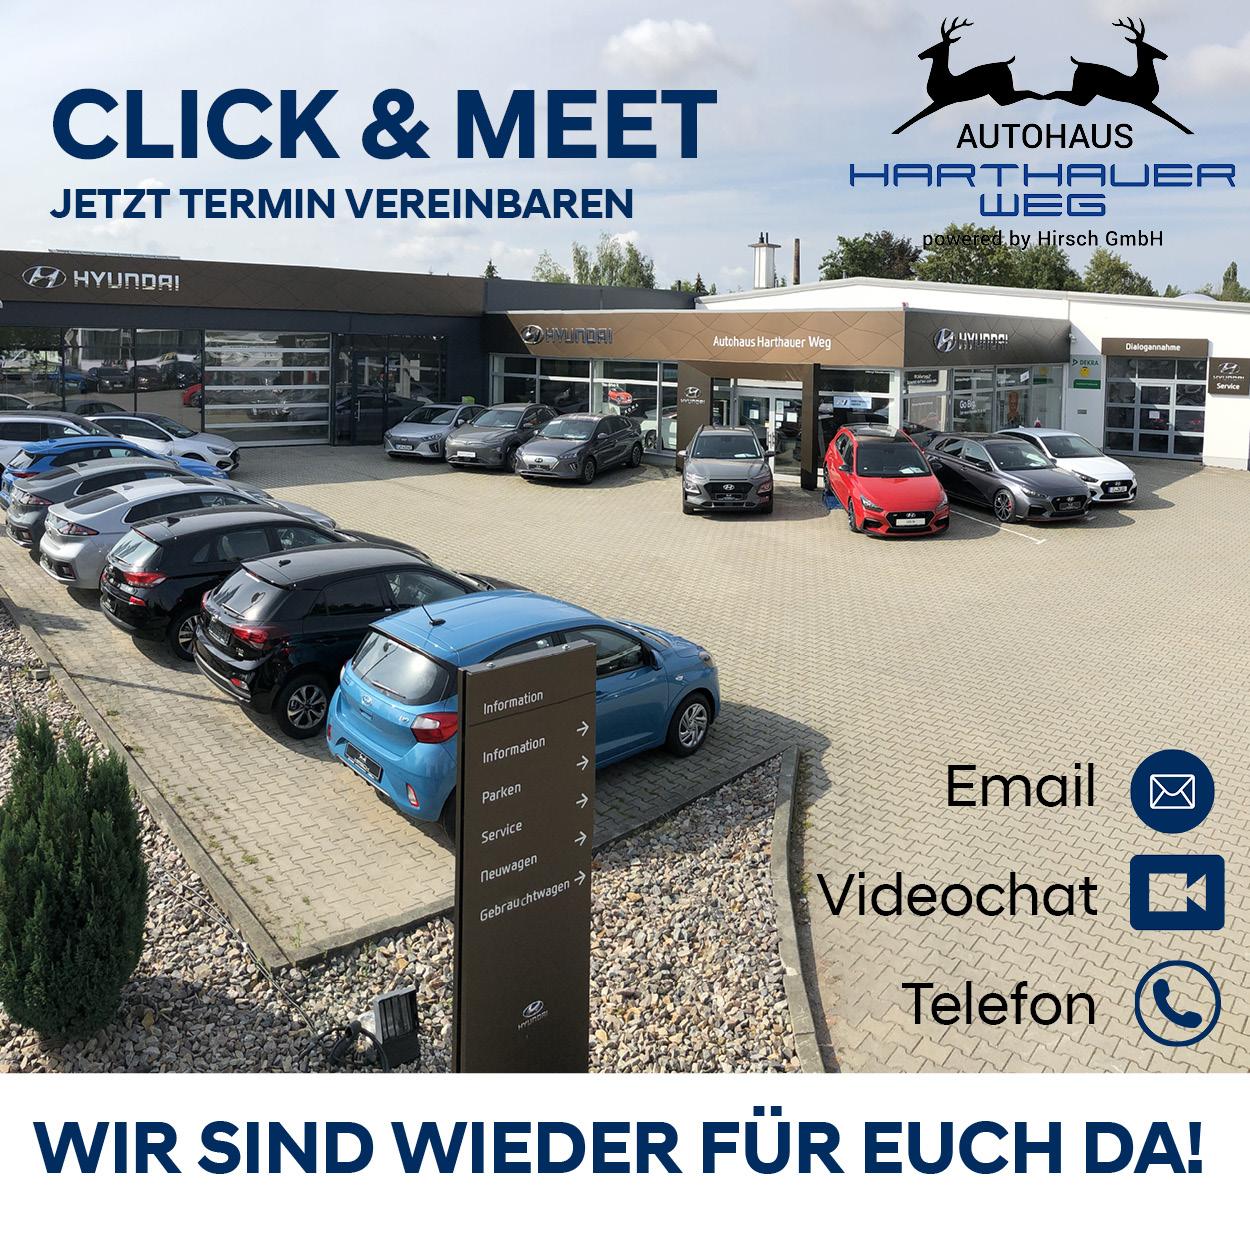 Hyundai Autohaus Harthauer Weg Crimmitschau